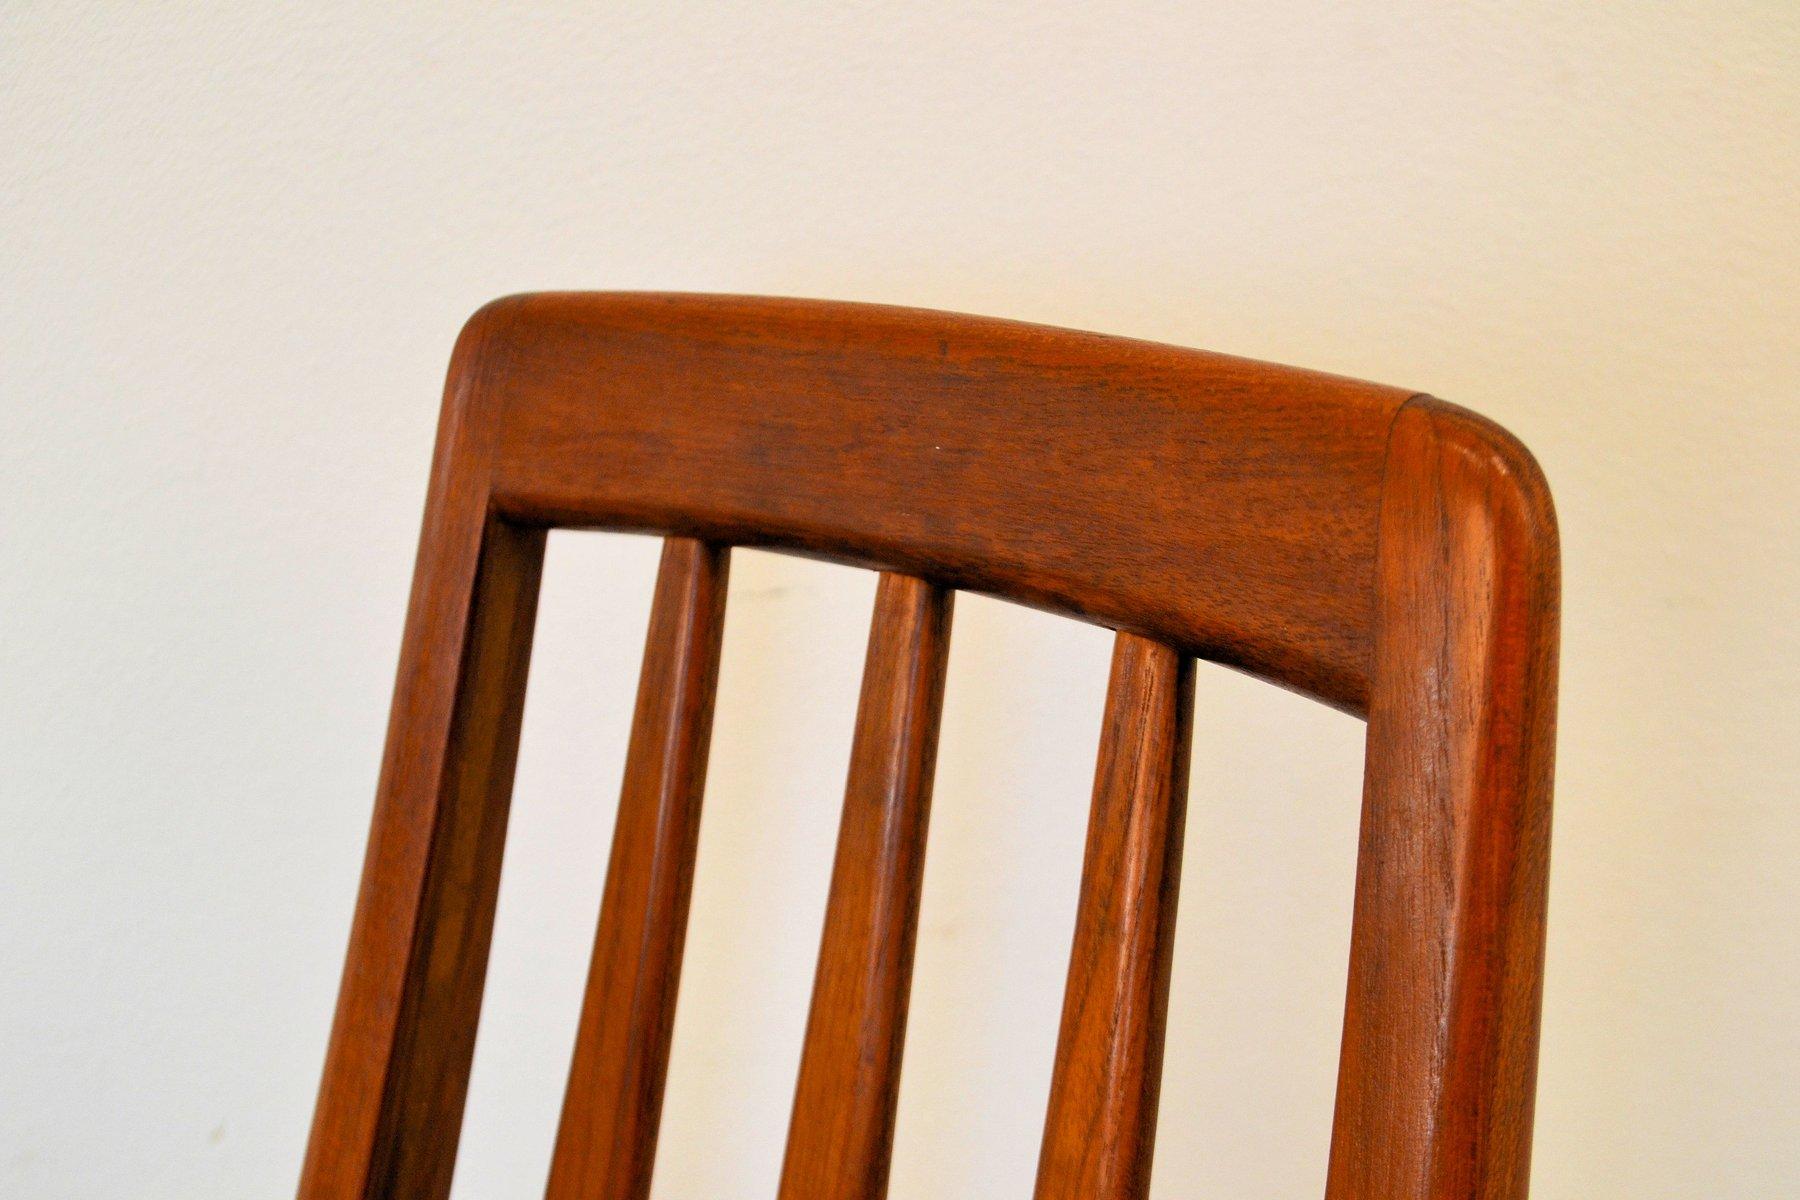 danish eva teak chairs by niels koefoeds for koefoeds hornslet 1960s